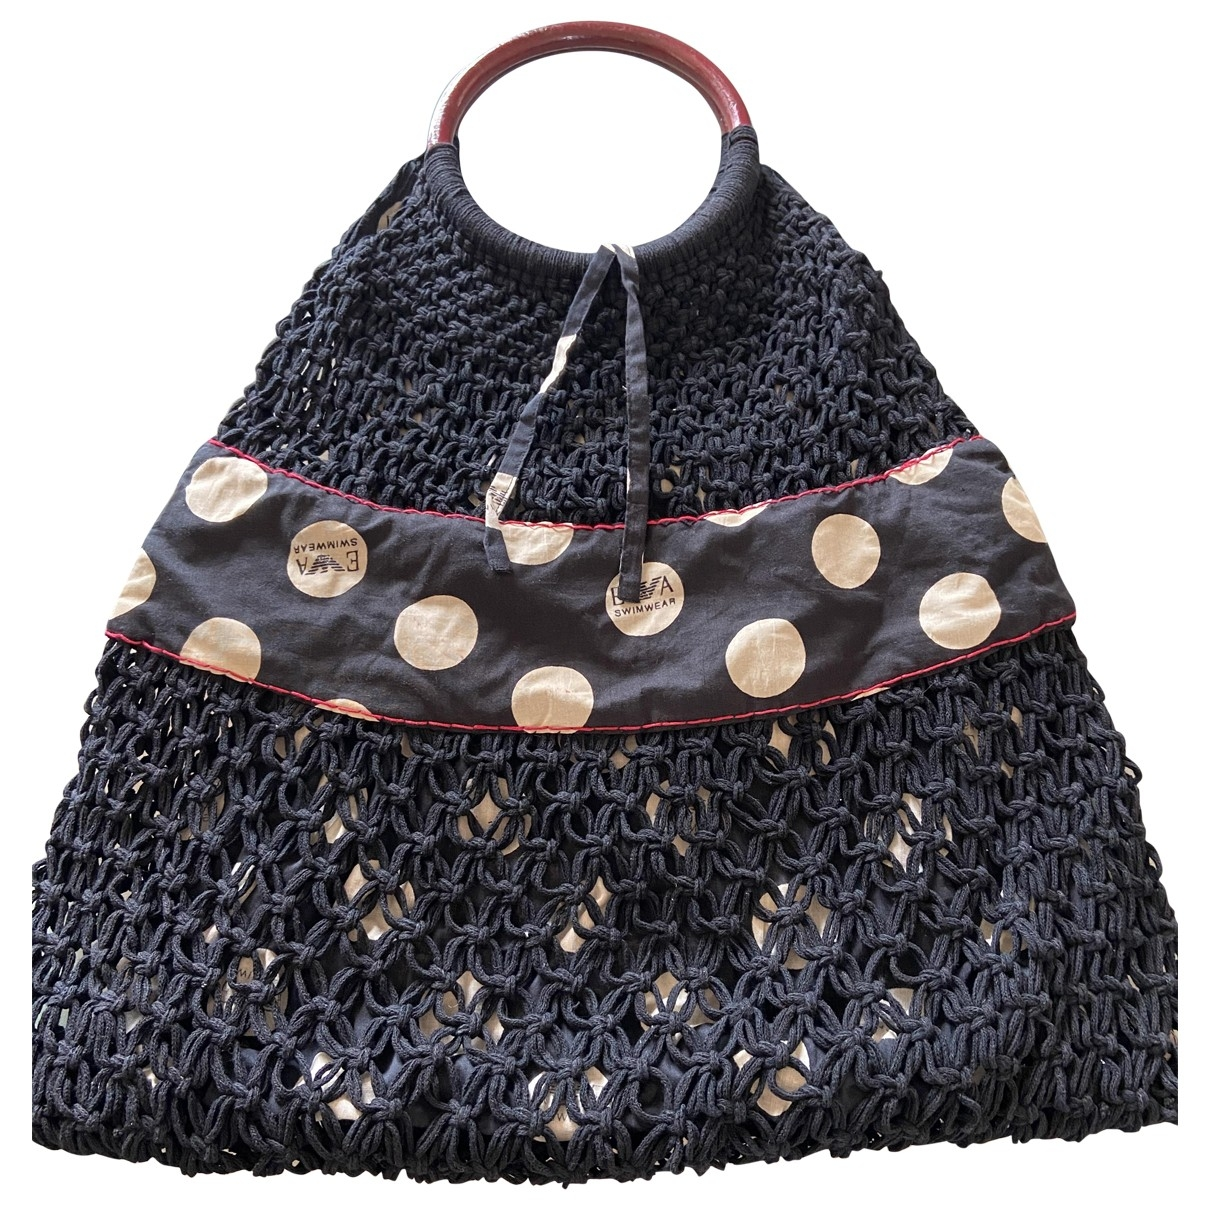 Emporio Armani \N Black Cotton handbag for Women \N